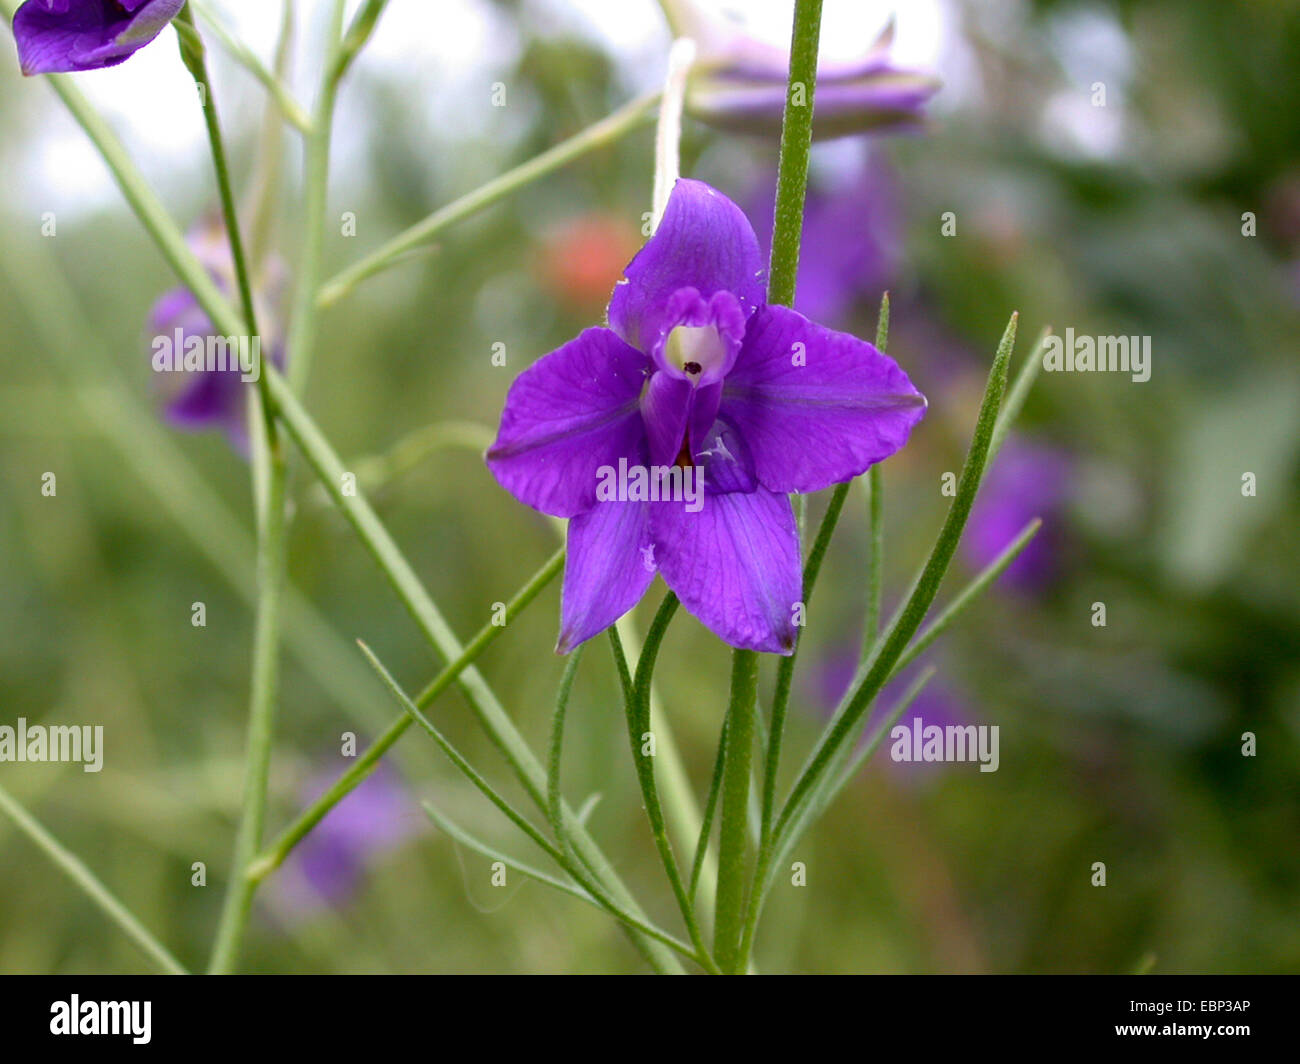 forking larkspur, field larkspur (Consolida regalis, Delphinium consolida), flower, Germany - Stock Image